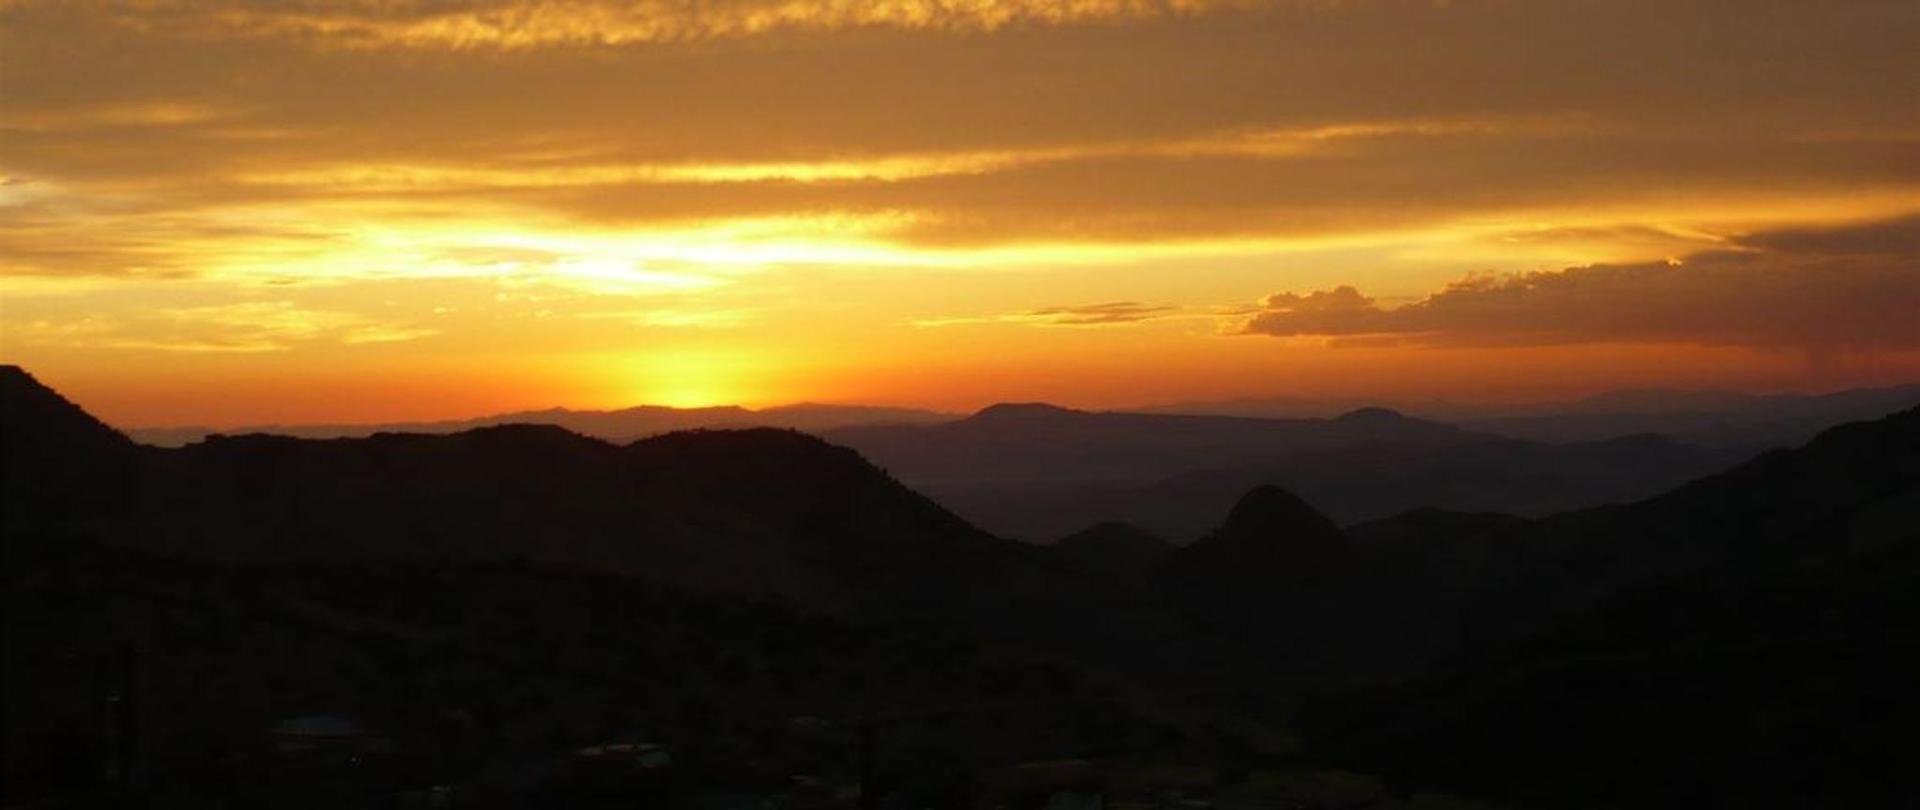 sunrise4.jpg.1140x481_0_276_5937.jpg